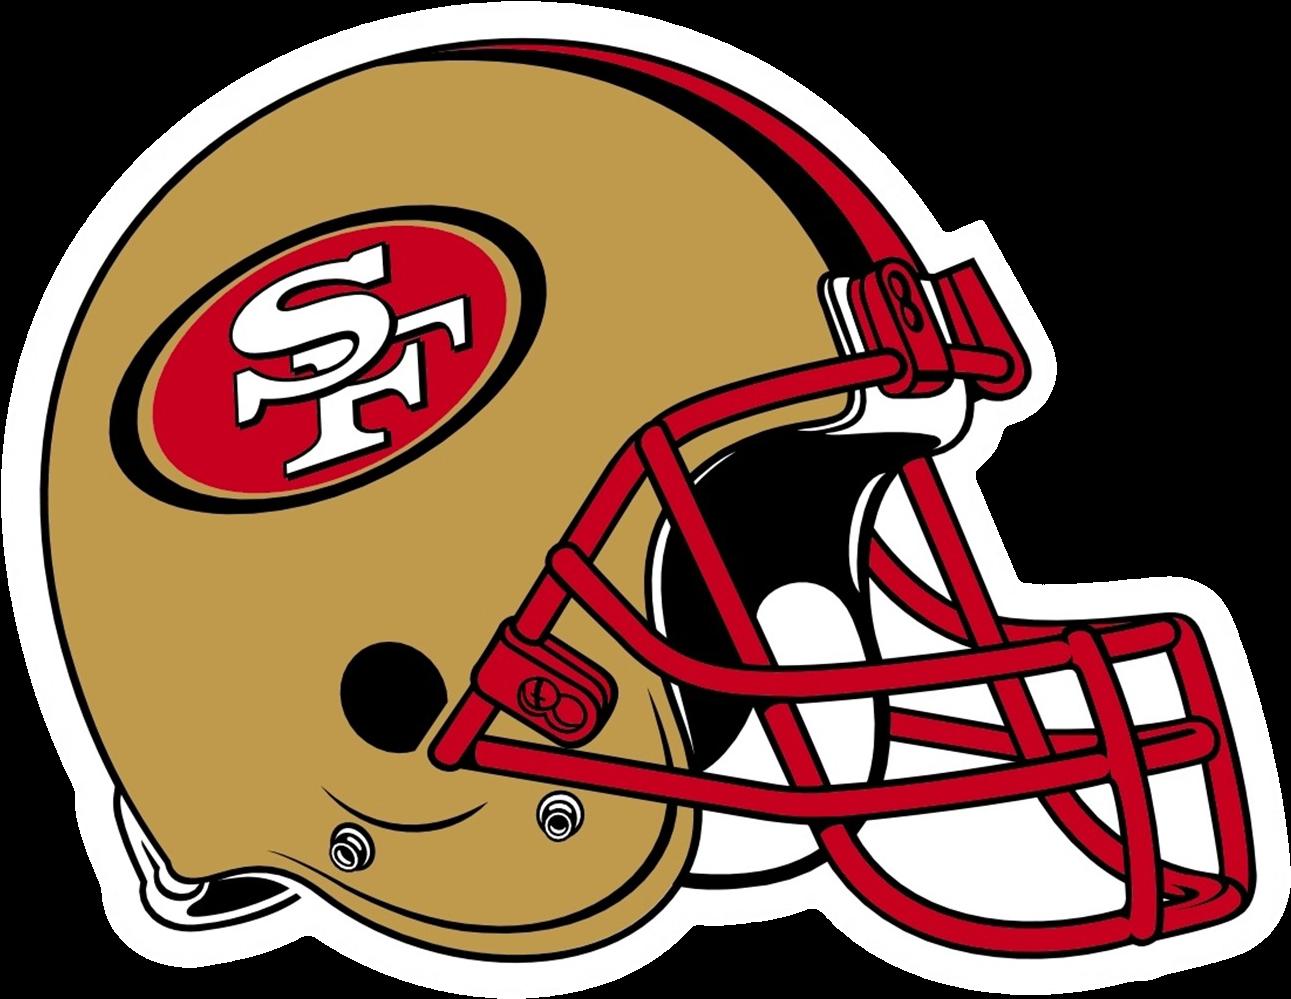 San Francisco 49ers Logo Png Transparent Amp Svg Vector New York Jets Helmet Logo Transparent Cartoon Jing Fm